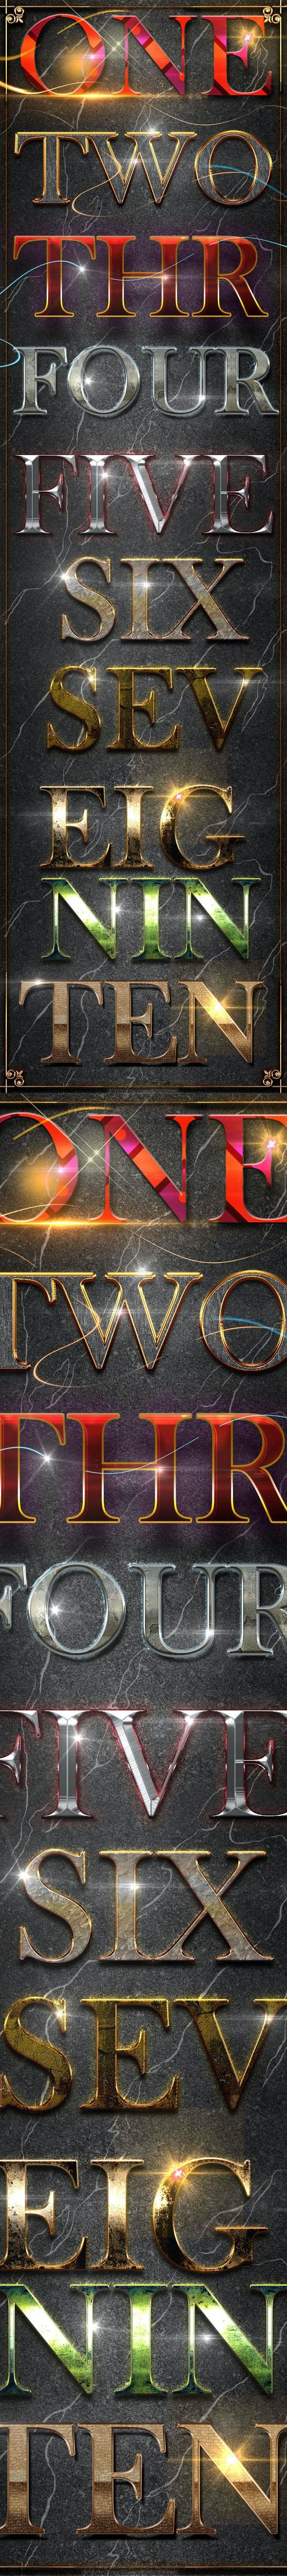 10 3D Text Styles D_35 - Text Effects Styles